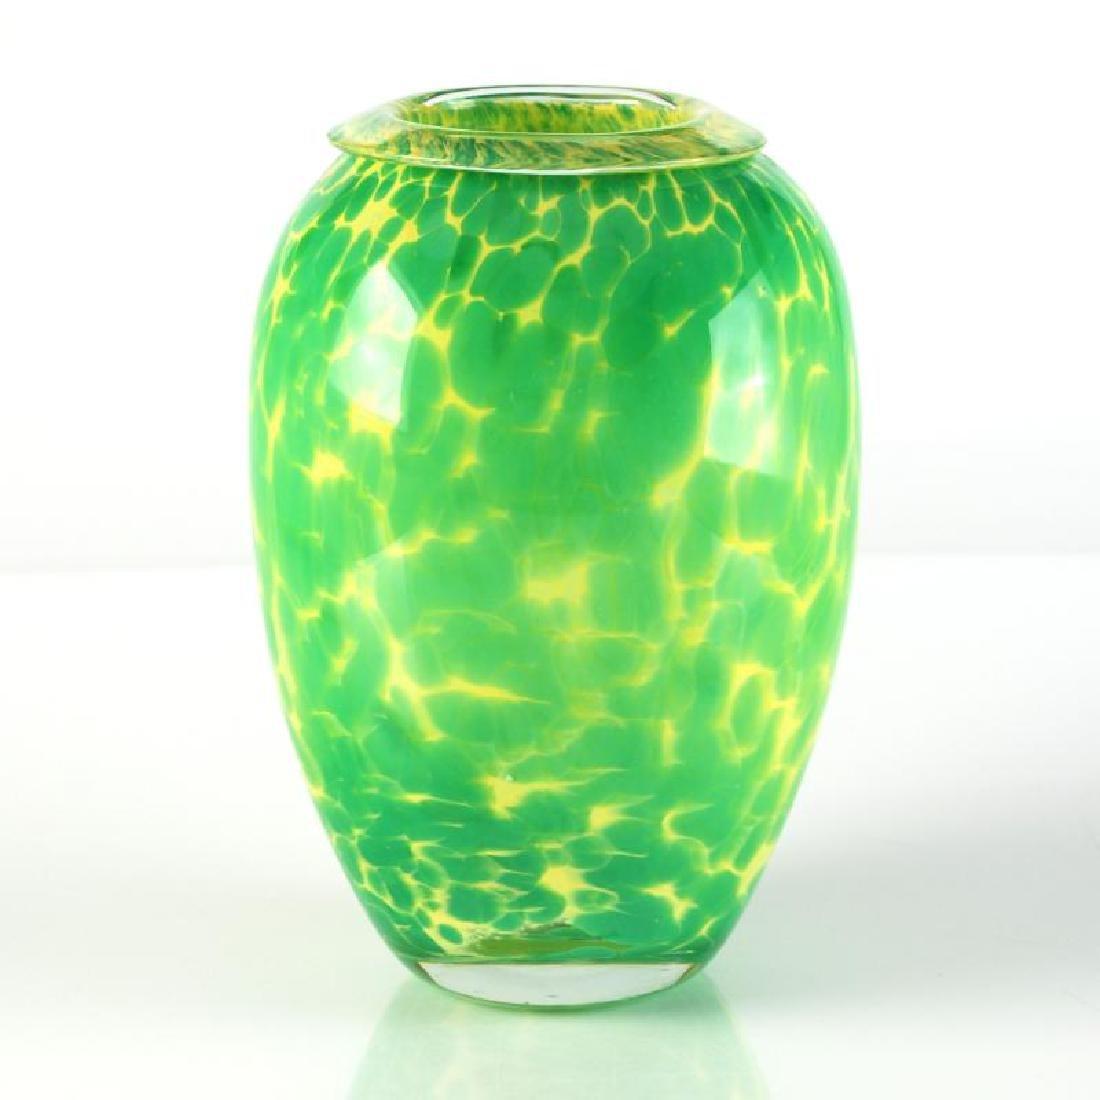 Original Hand-Blown Glass Vase Sculpture by Jean Claude